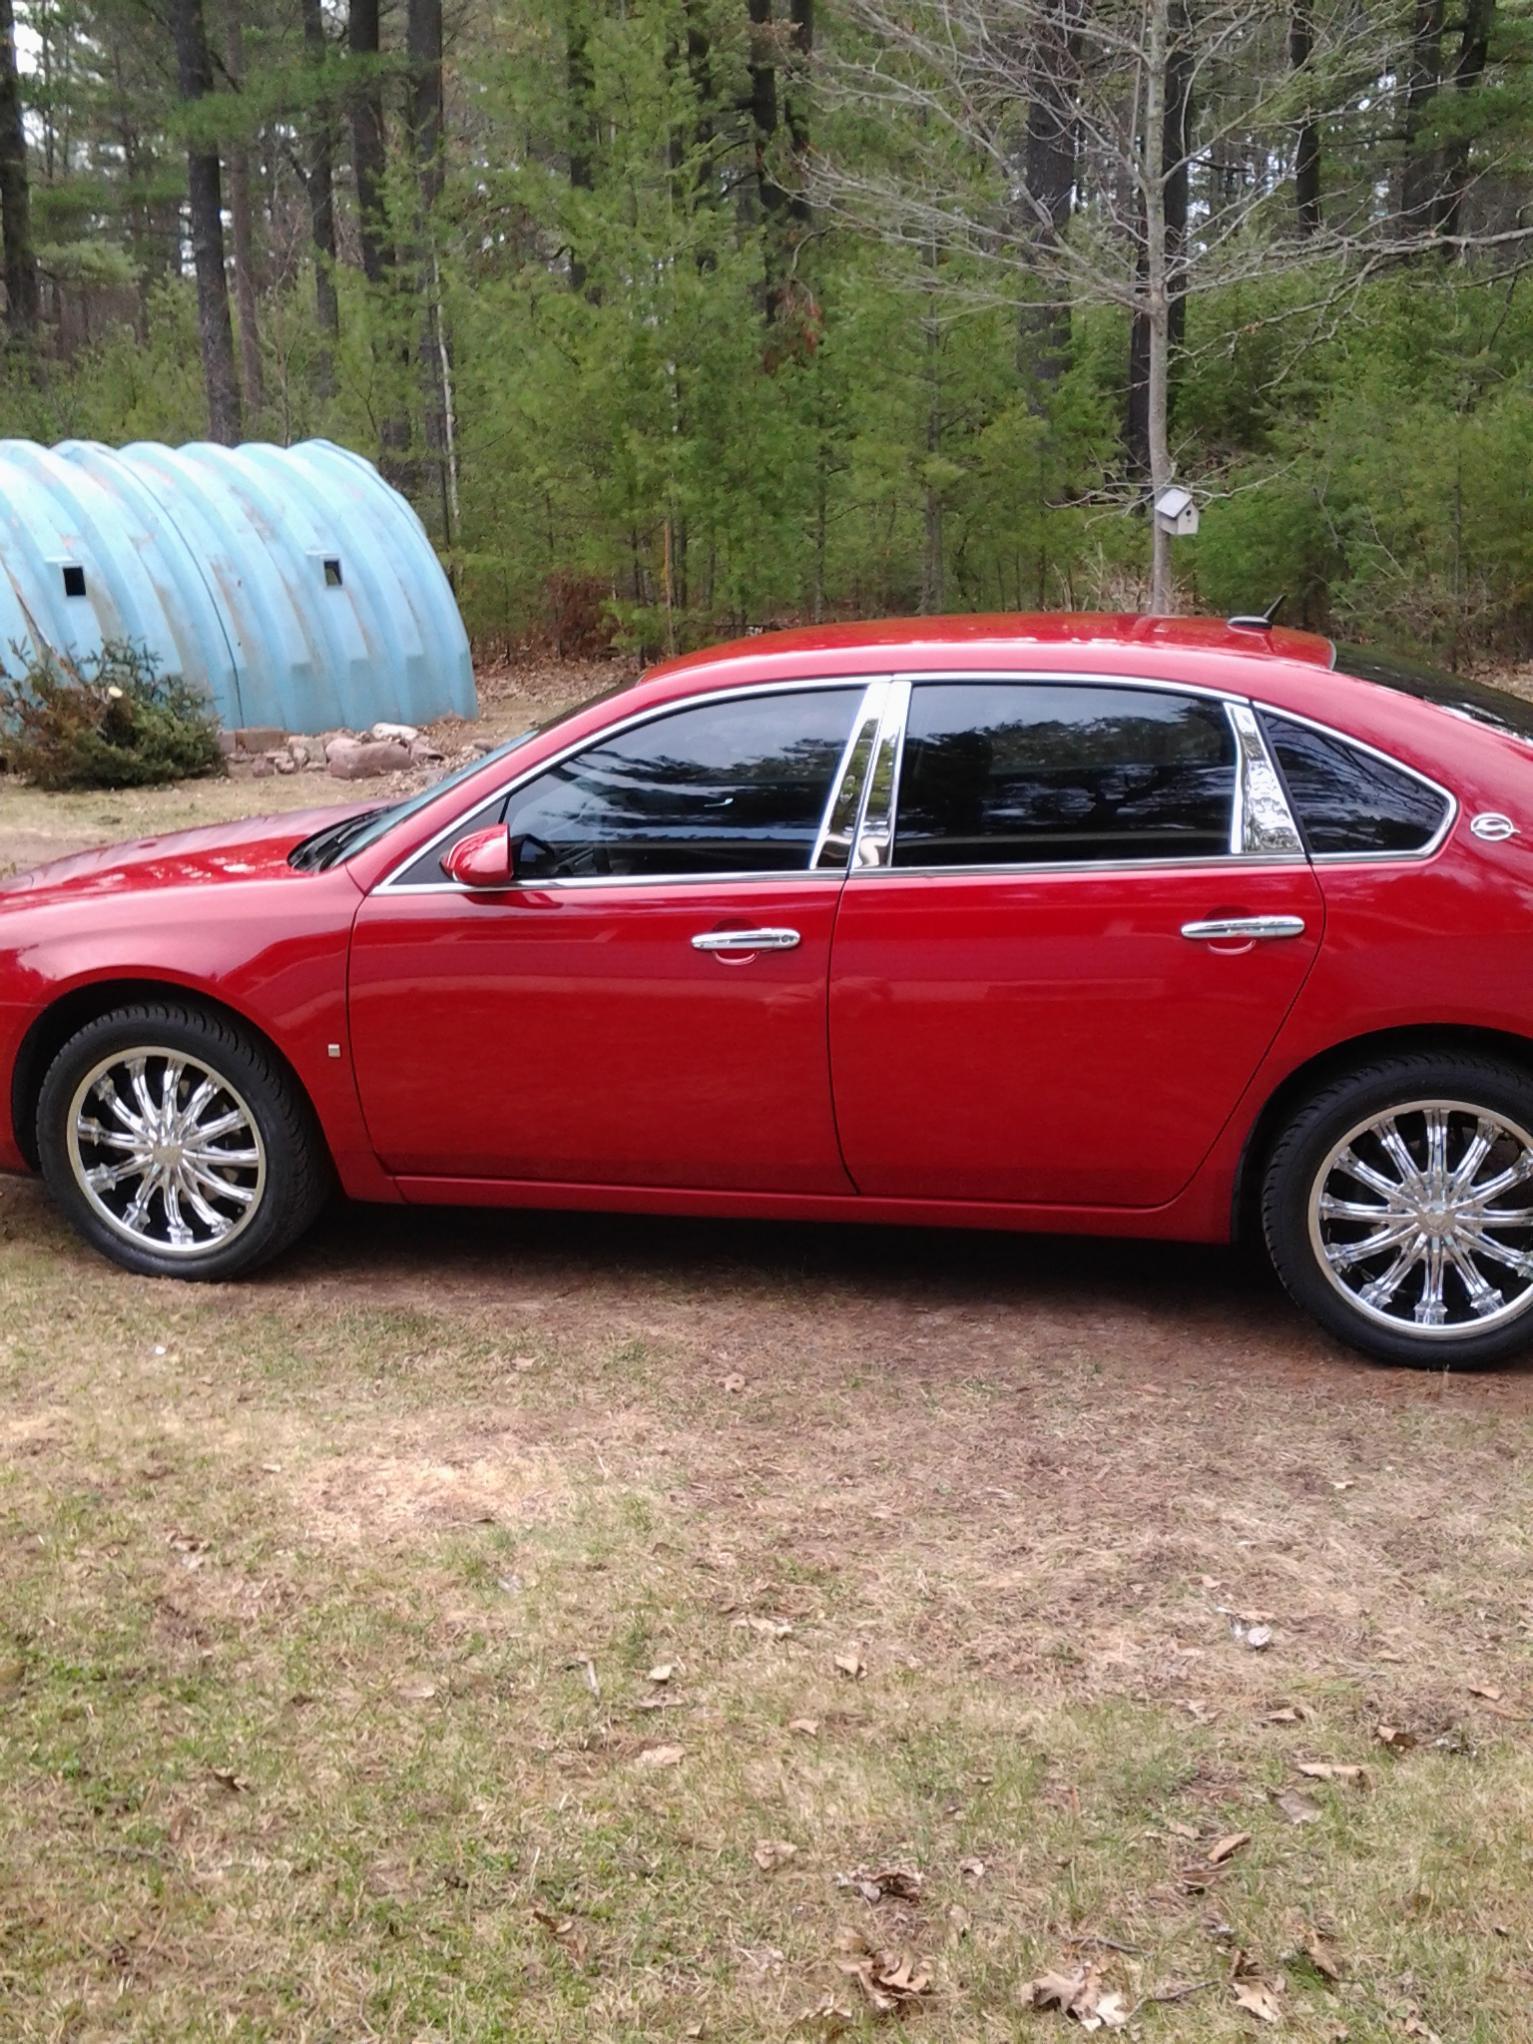 18 inch rims 2008 impala chevy impala forums. Black Bedroom Furniture Sets. Home Design Ideas